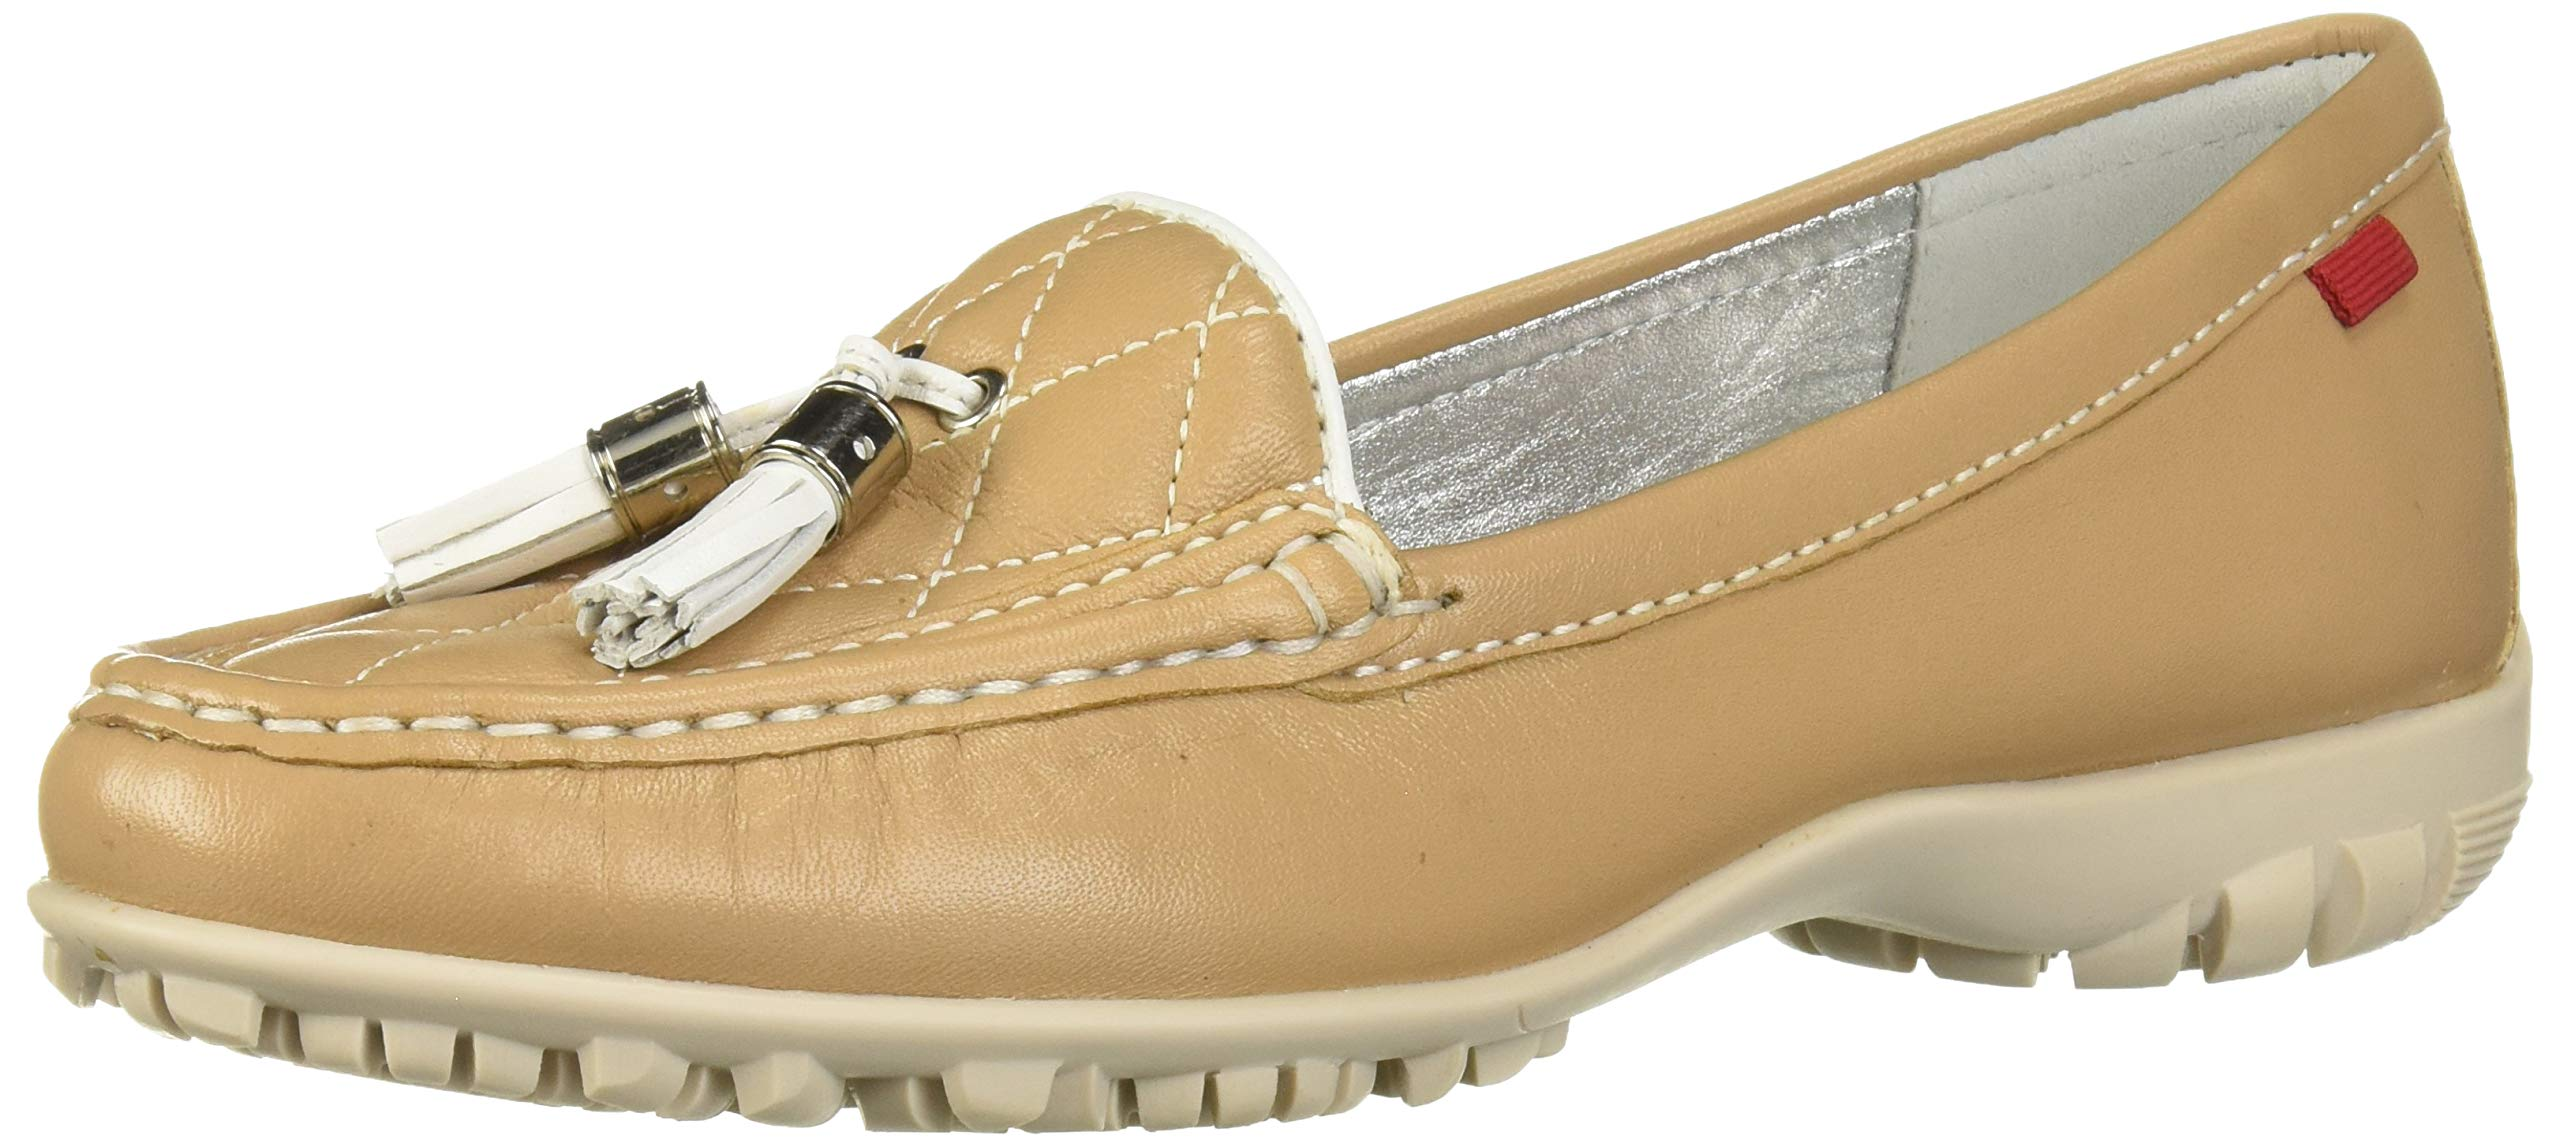 Marc Joseph New York Women's Womens Genuine Leather Made in Brazil Wall Street Golf Shoe Athletic Shoe, Sand nappa/White, 8.5 M US by MARC JOSEPH NEW YORK